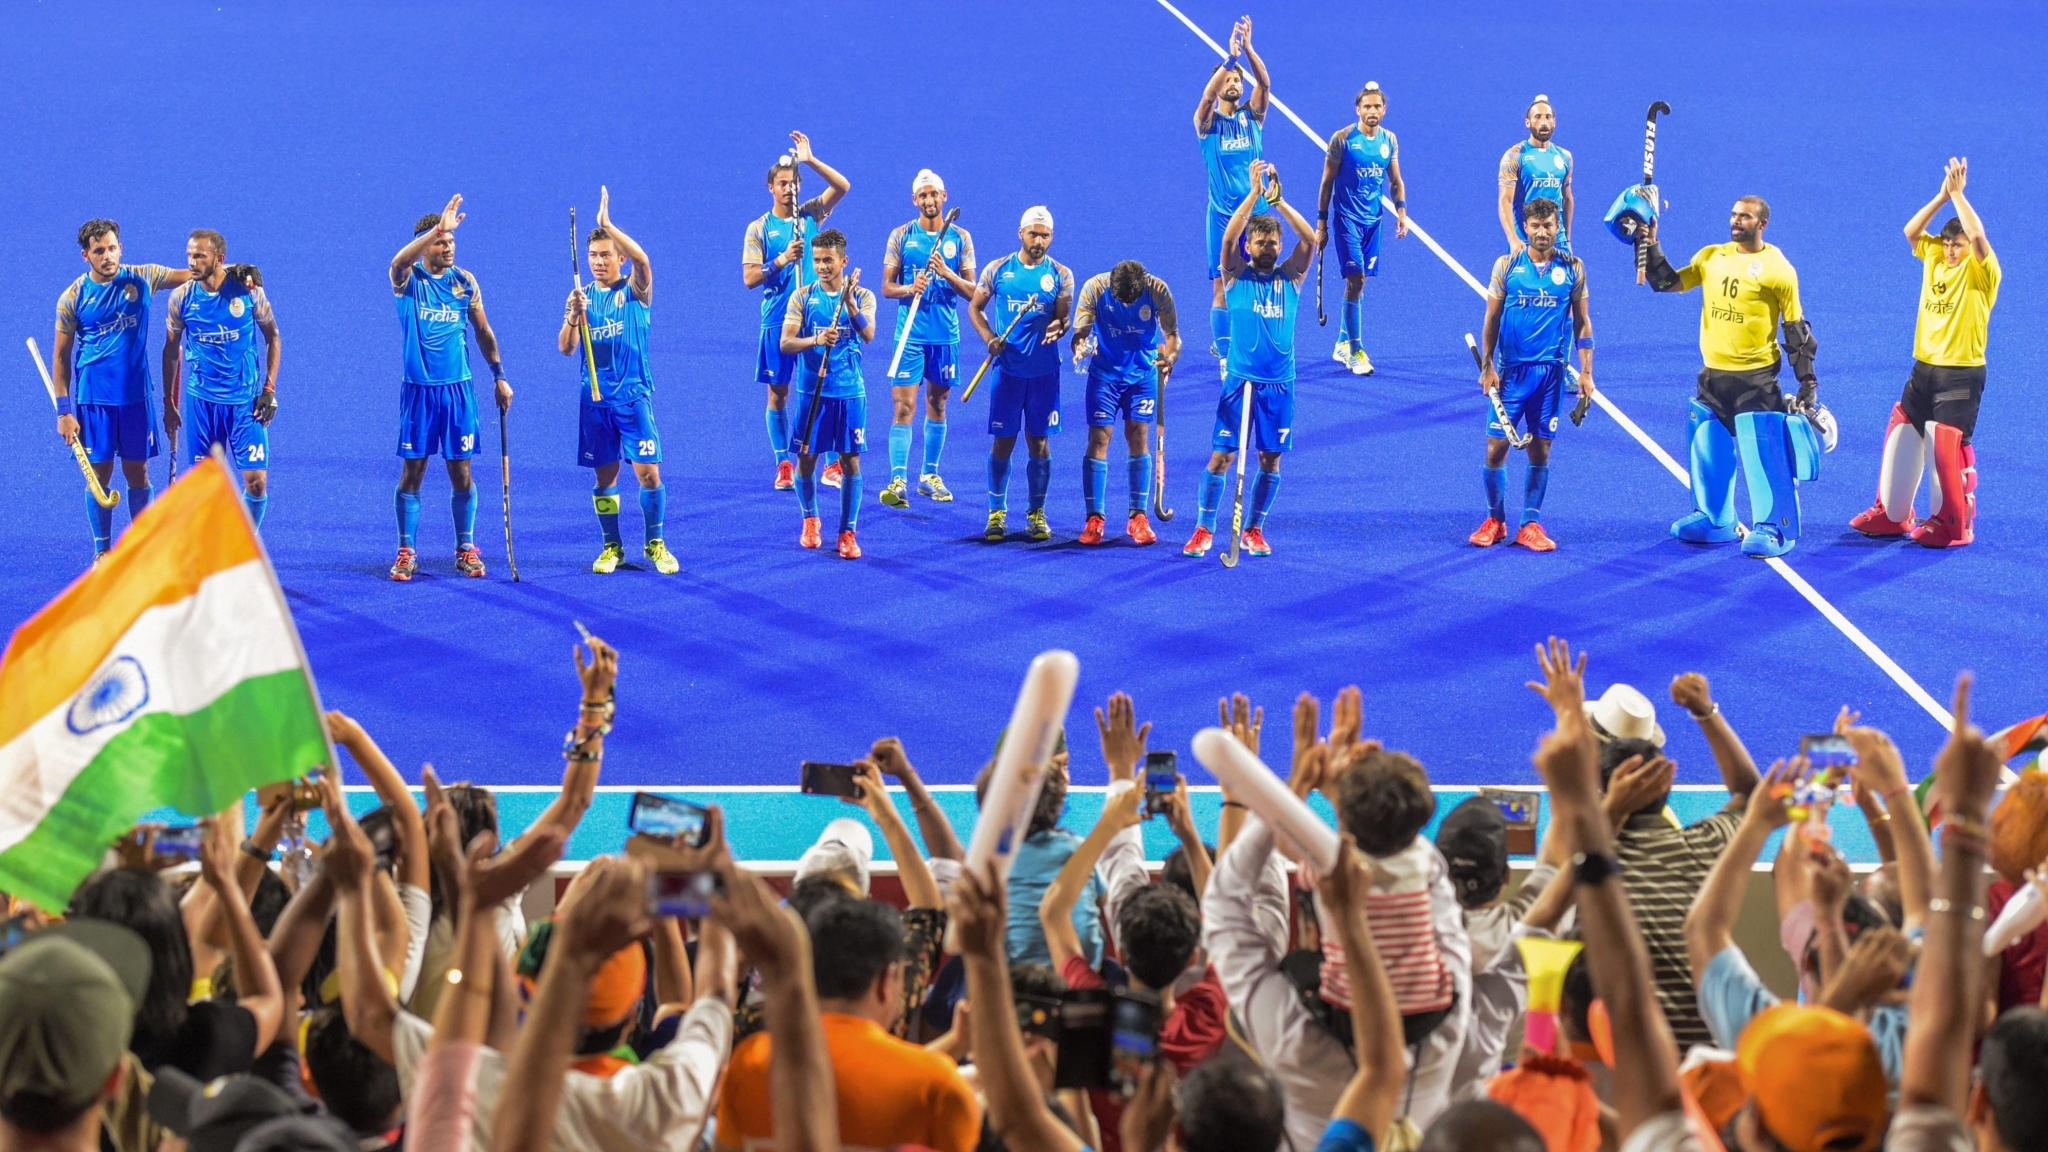 Bhubaneswar, Rourkela to Host 2023 Men's Hockey World Cup